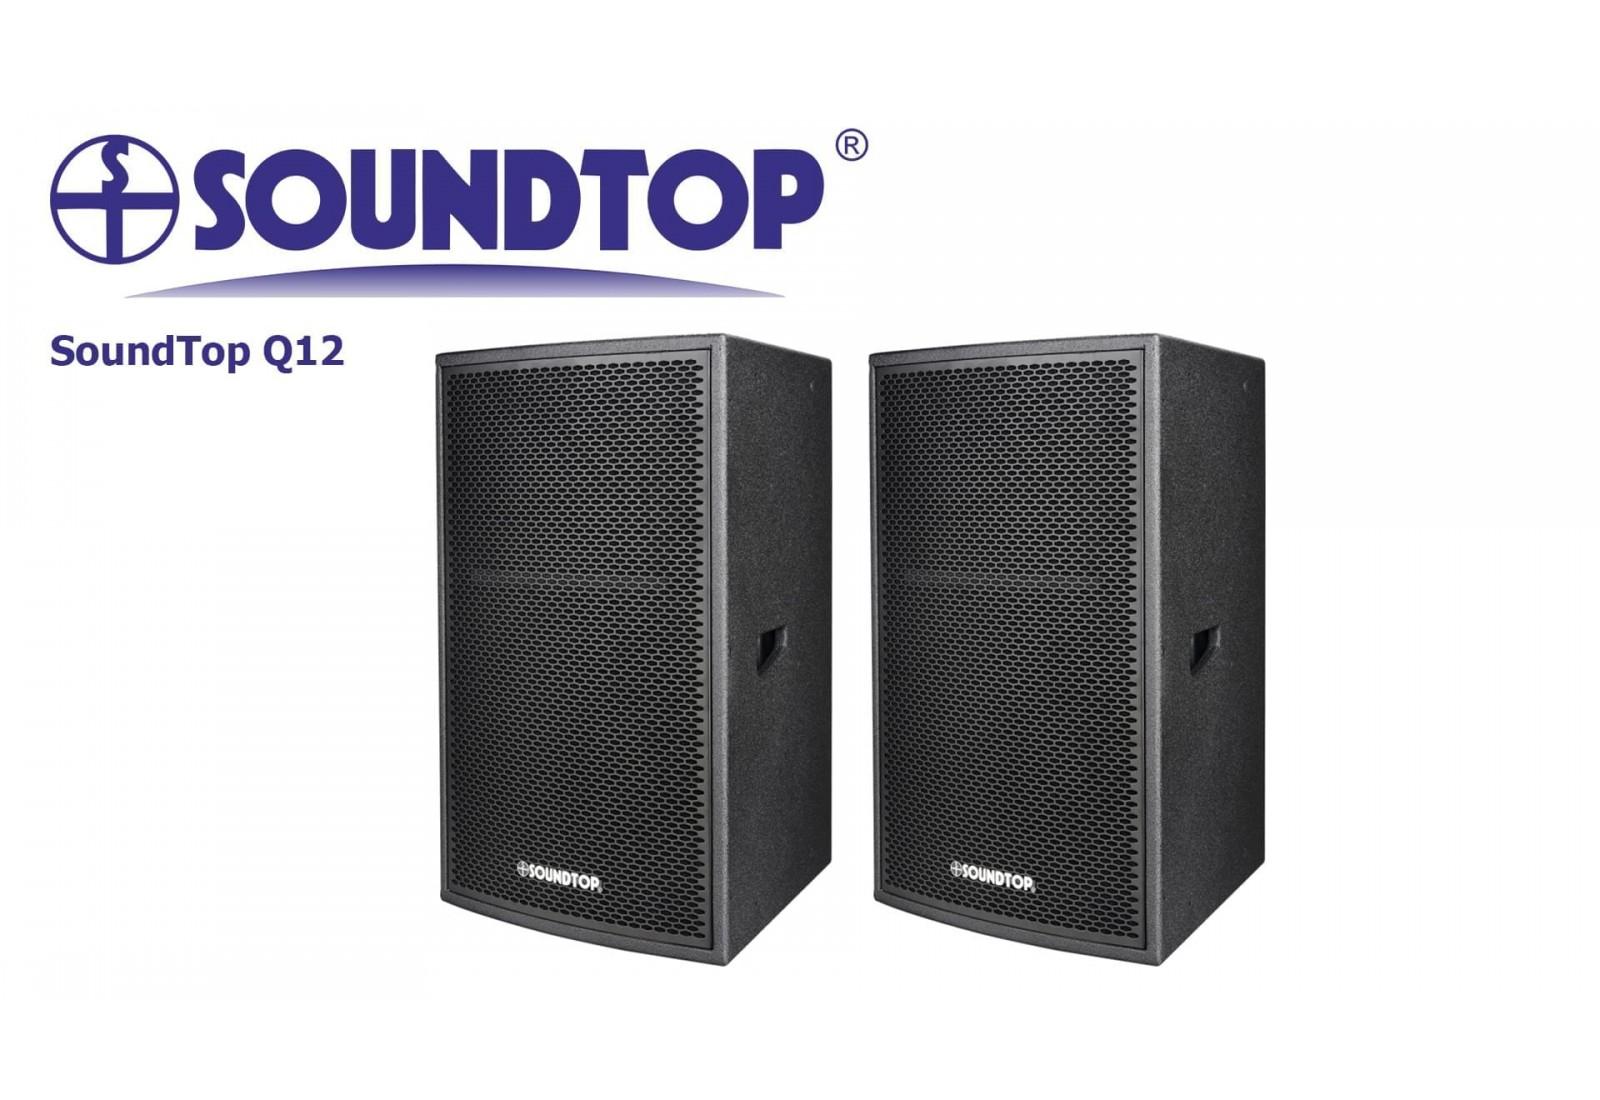 SoundTop Q12